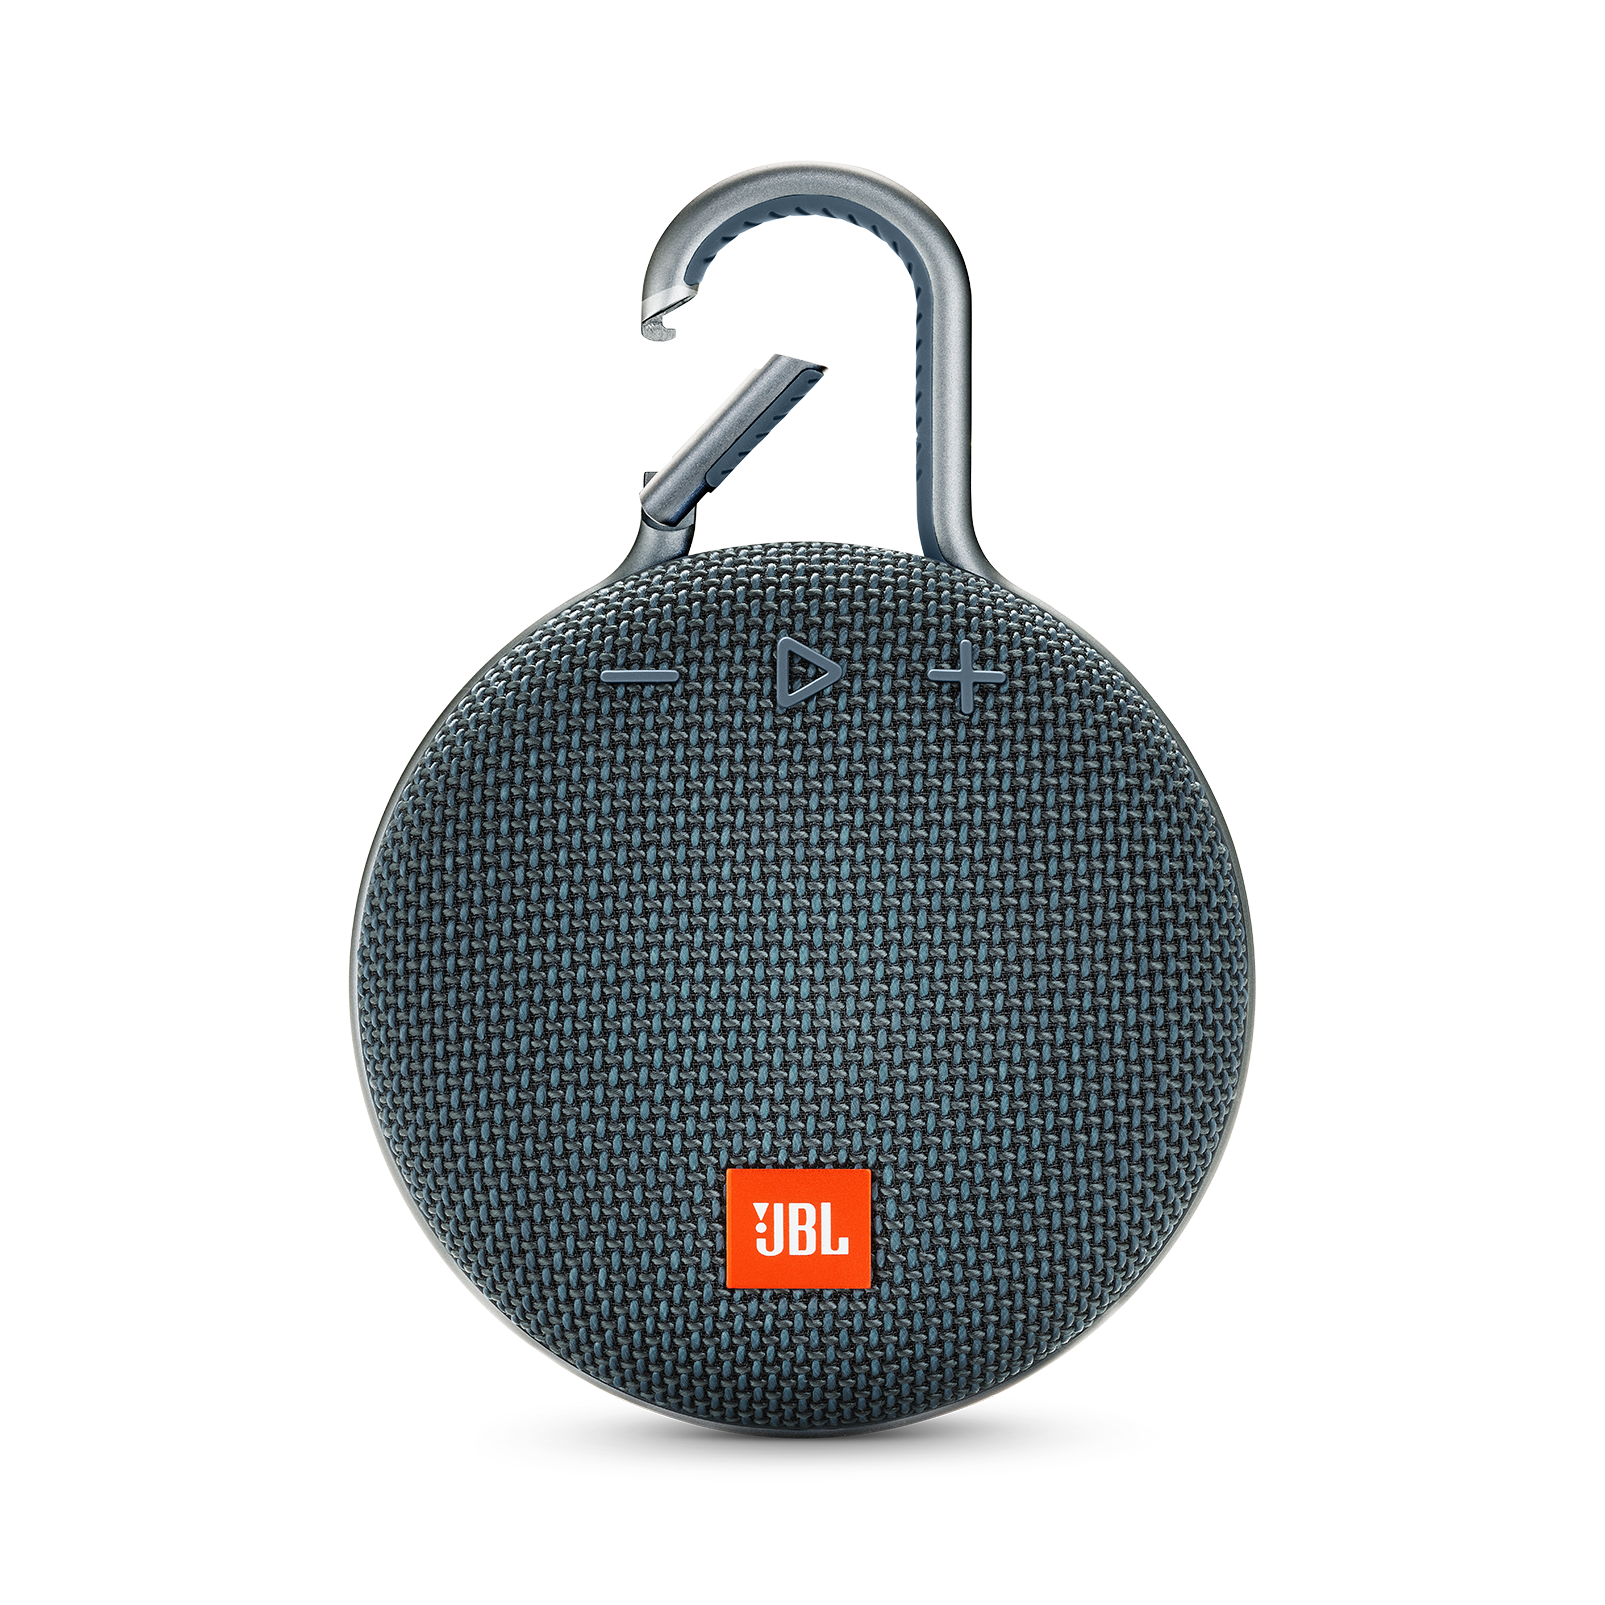 JBL CLIP 3 - Ocean Blue - Portable Bluetooth® speaker - Front